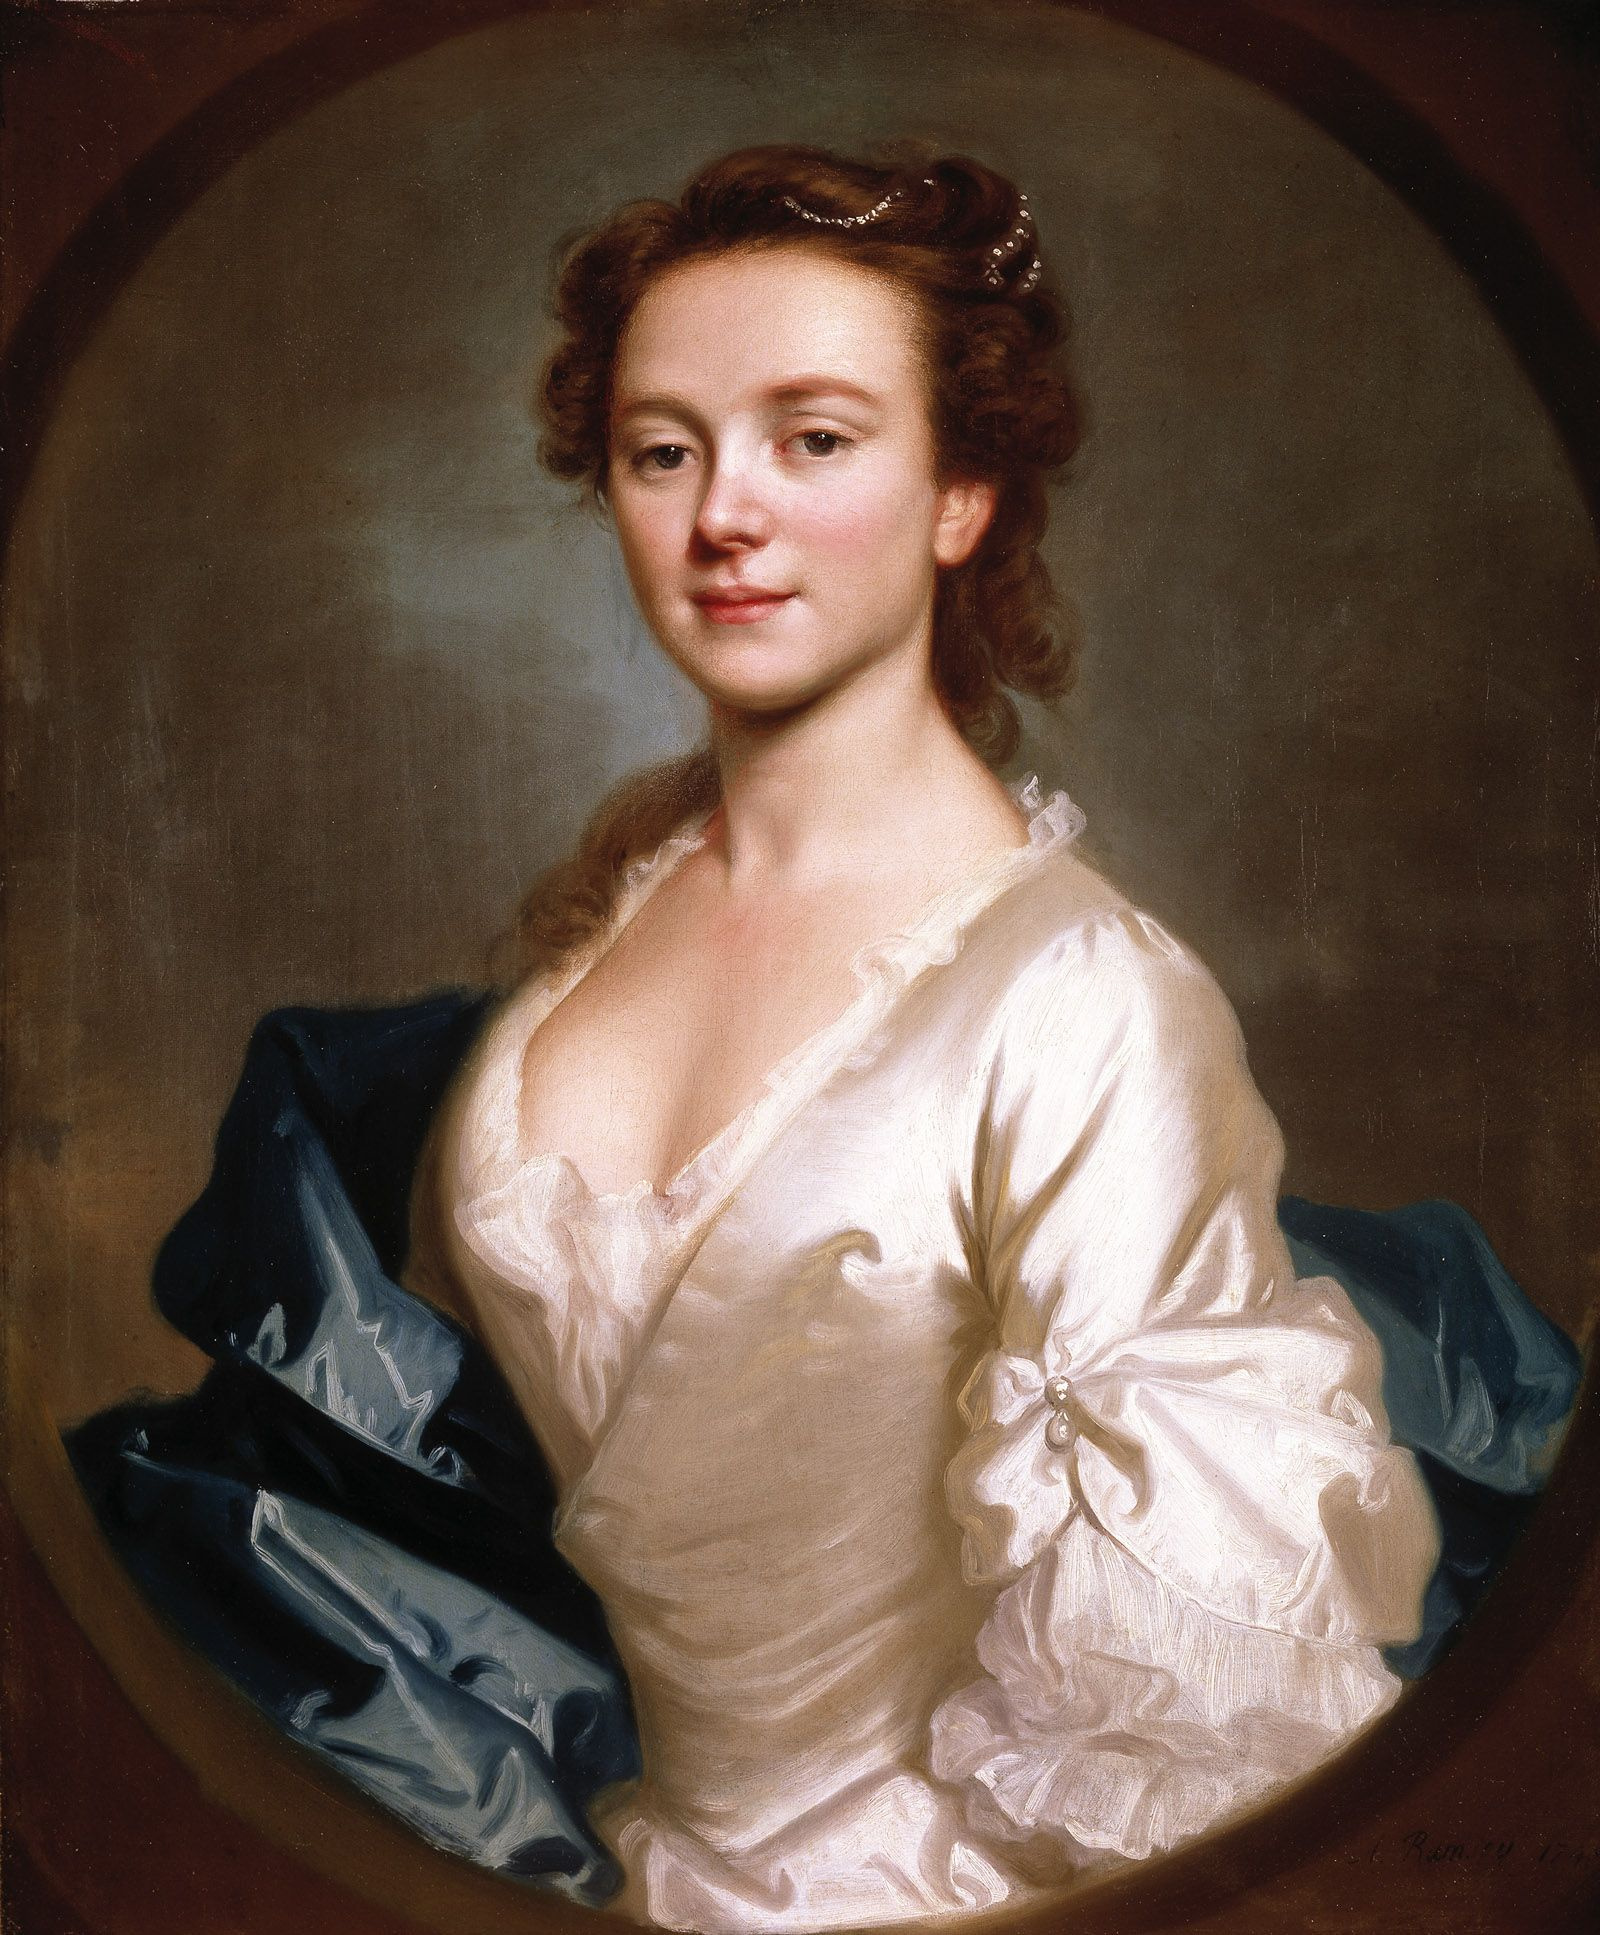 peintres anglais du XVIIIème siècle Miss-craigie-1741